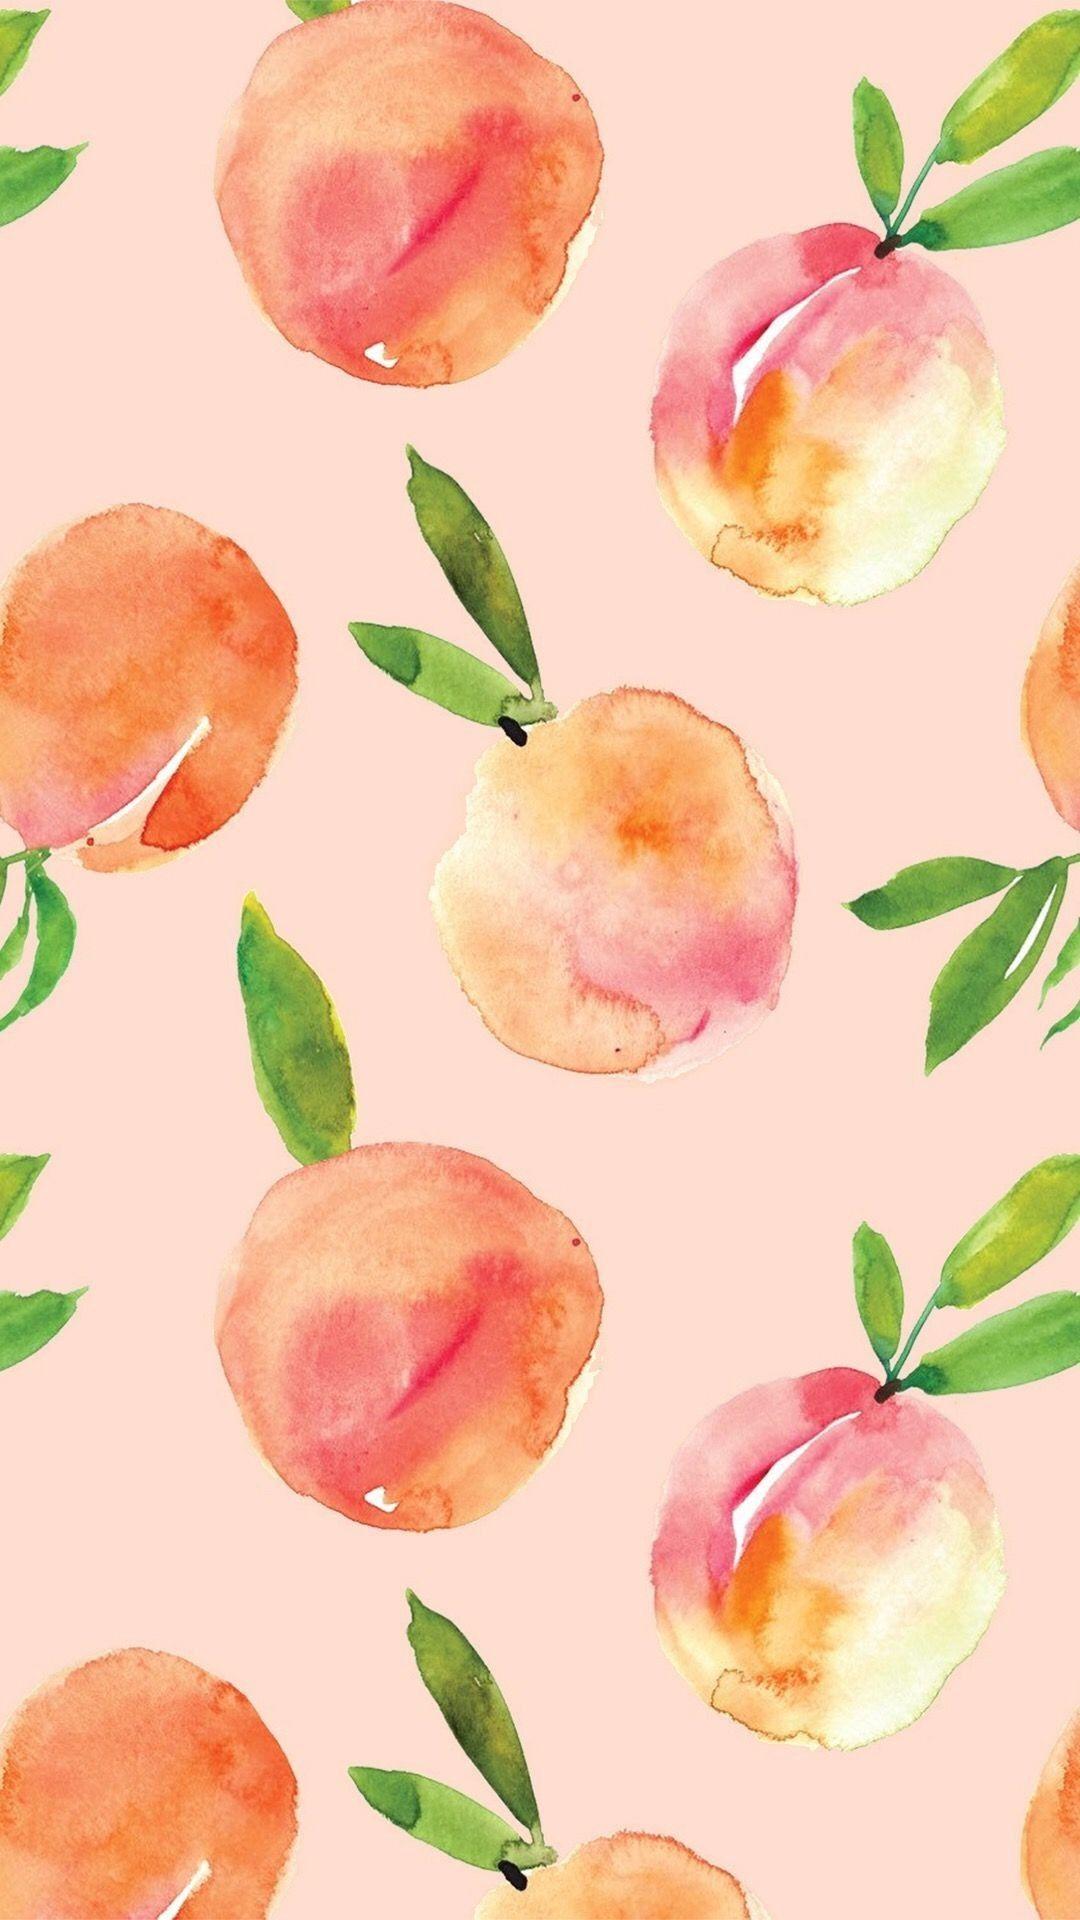 Oceanbreezeandhoneybees Oldfarmhouse Watercolour S Pinterest Com Wallpaper Iphone Summer Peach Wallpaper Watercolor Wallpaper